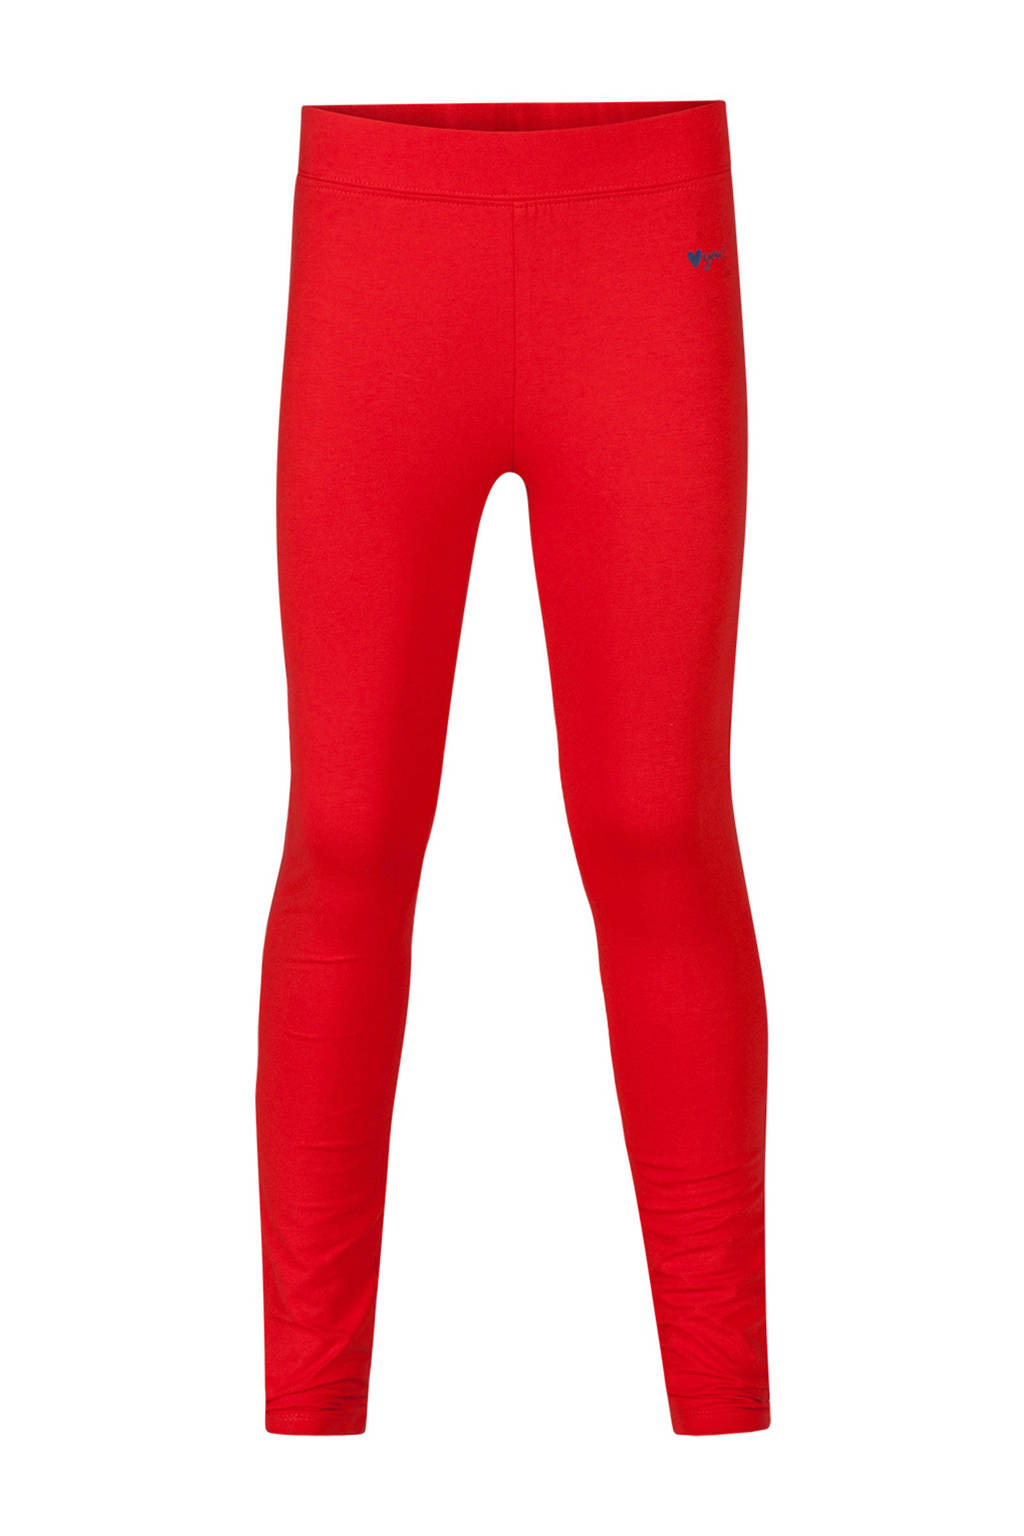 WE Fashion Fundamental legging rood, Rood